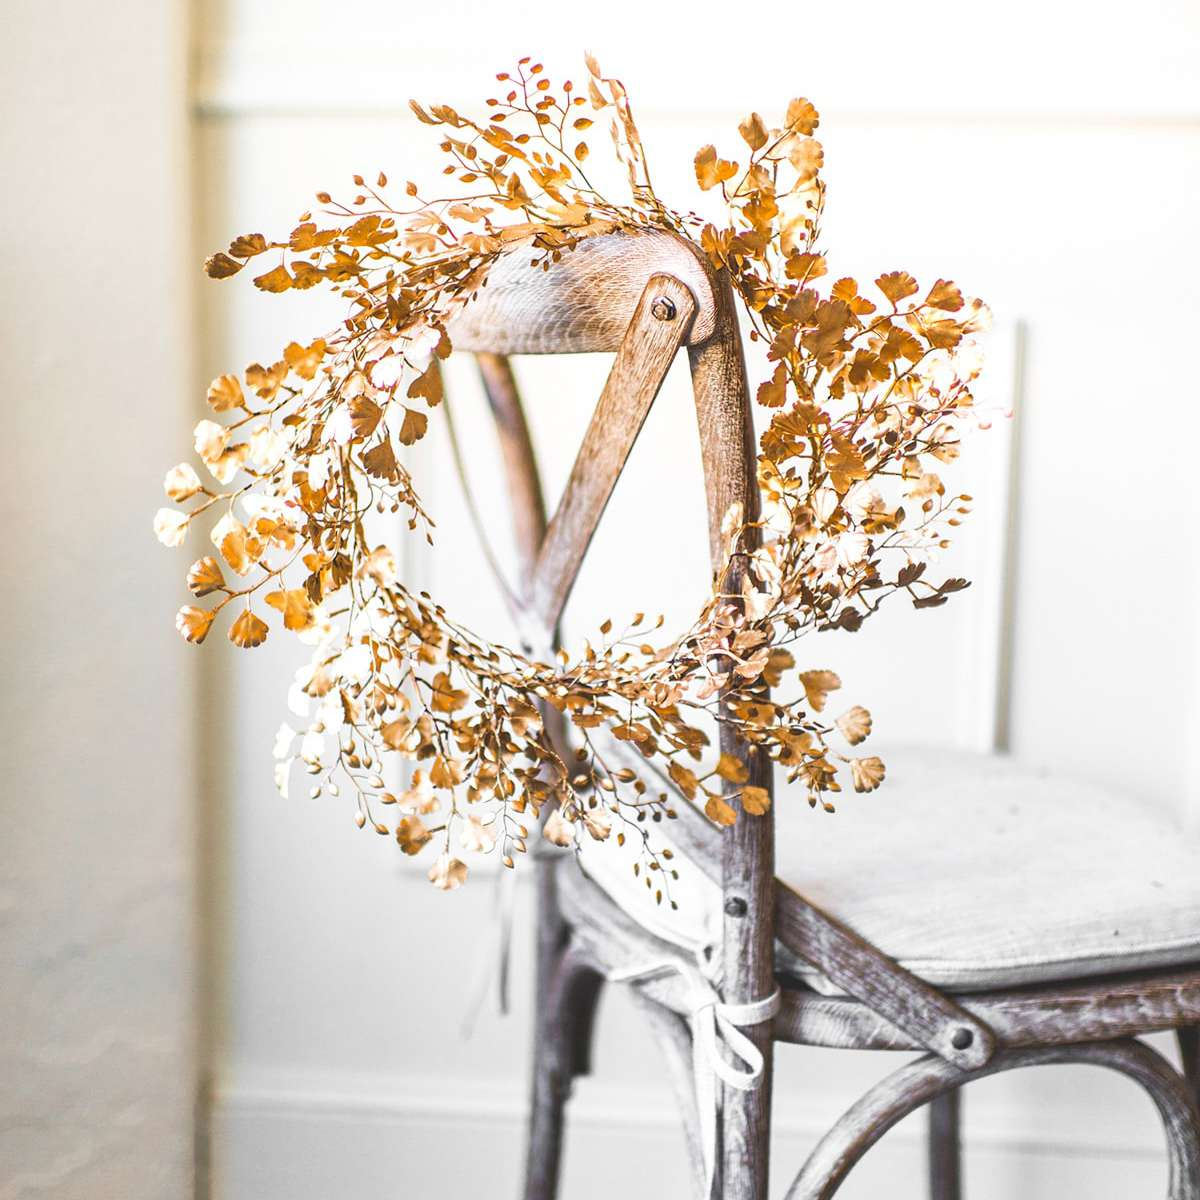 leafy wreath spray-painted gold